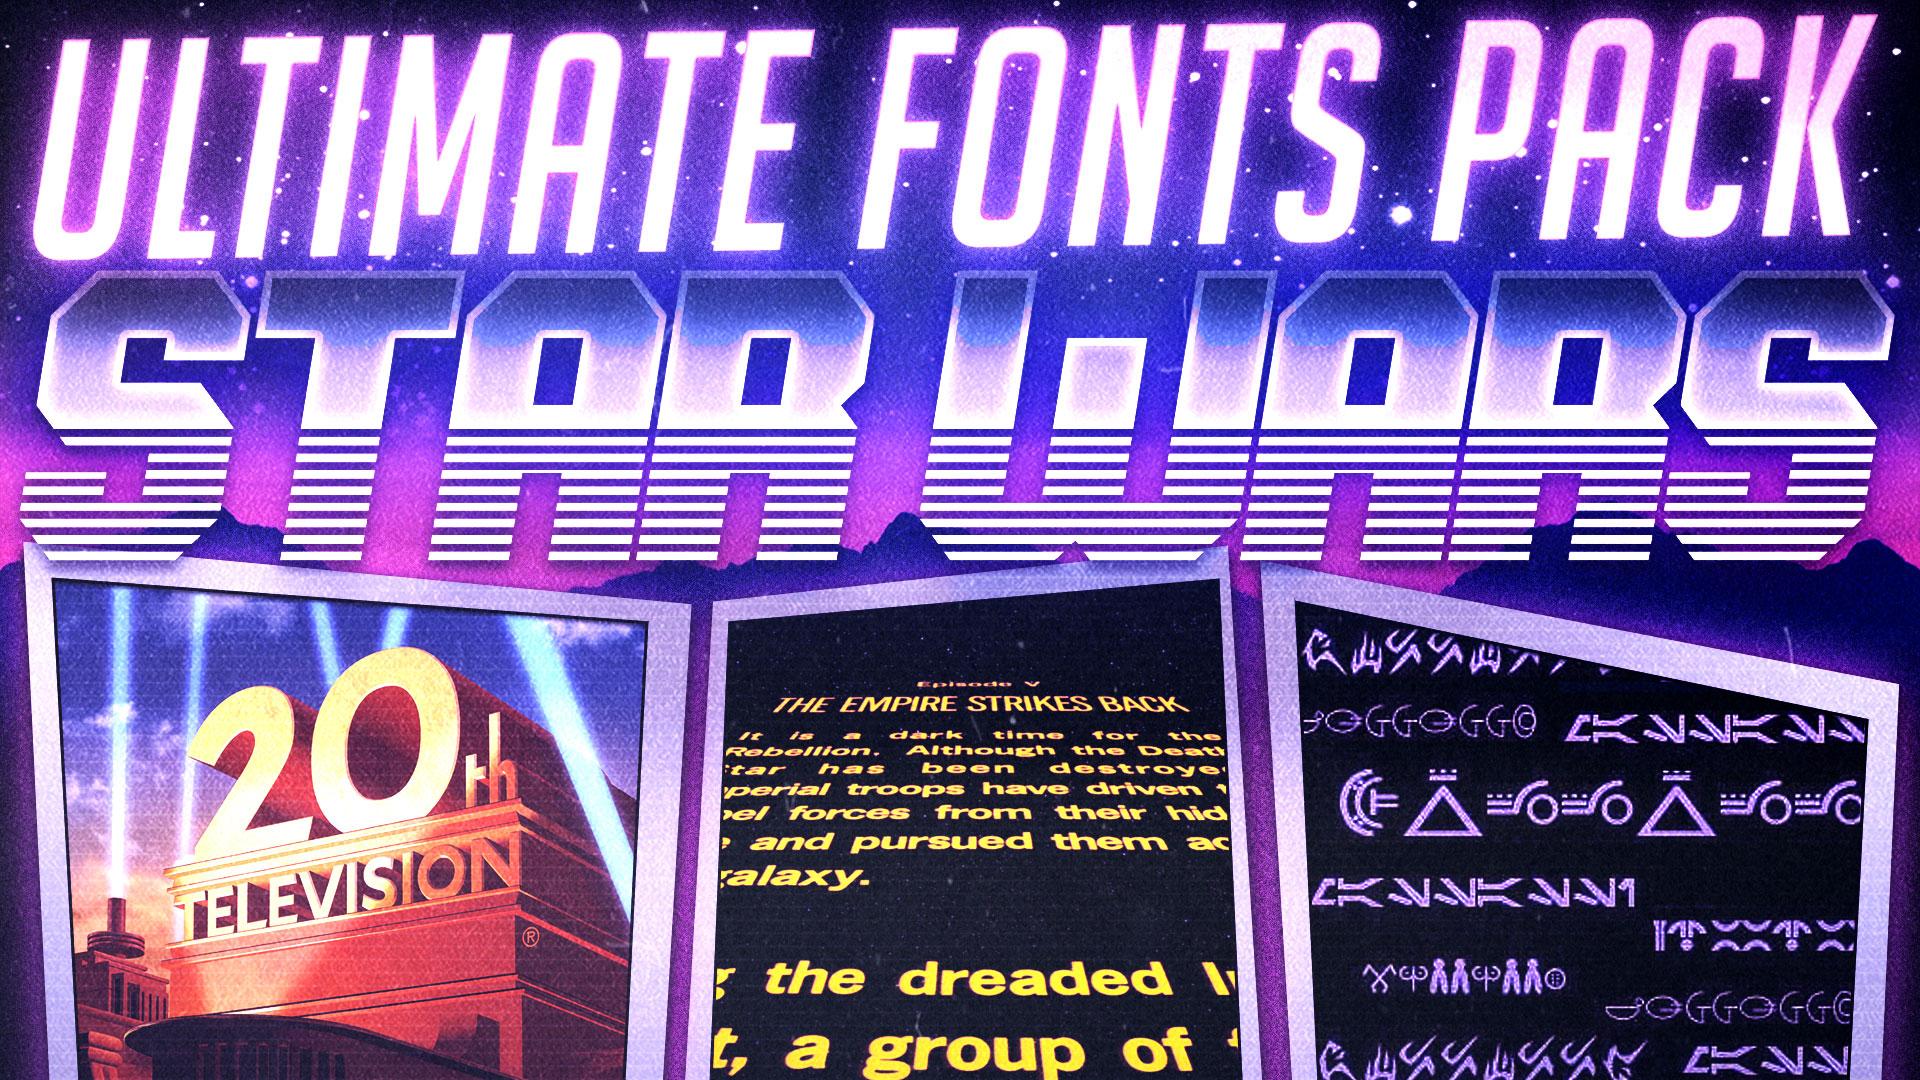 Star Wars   Ultimate Fonts Pack